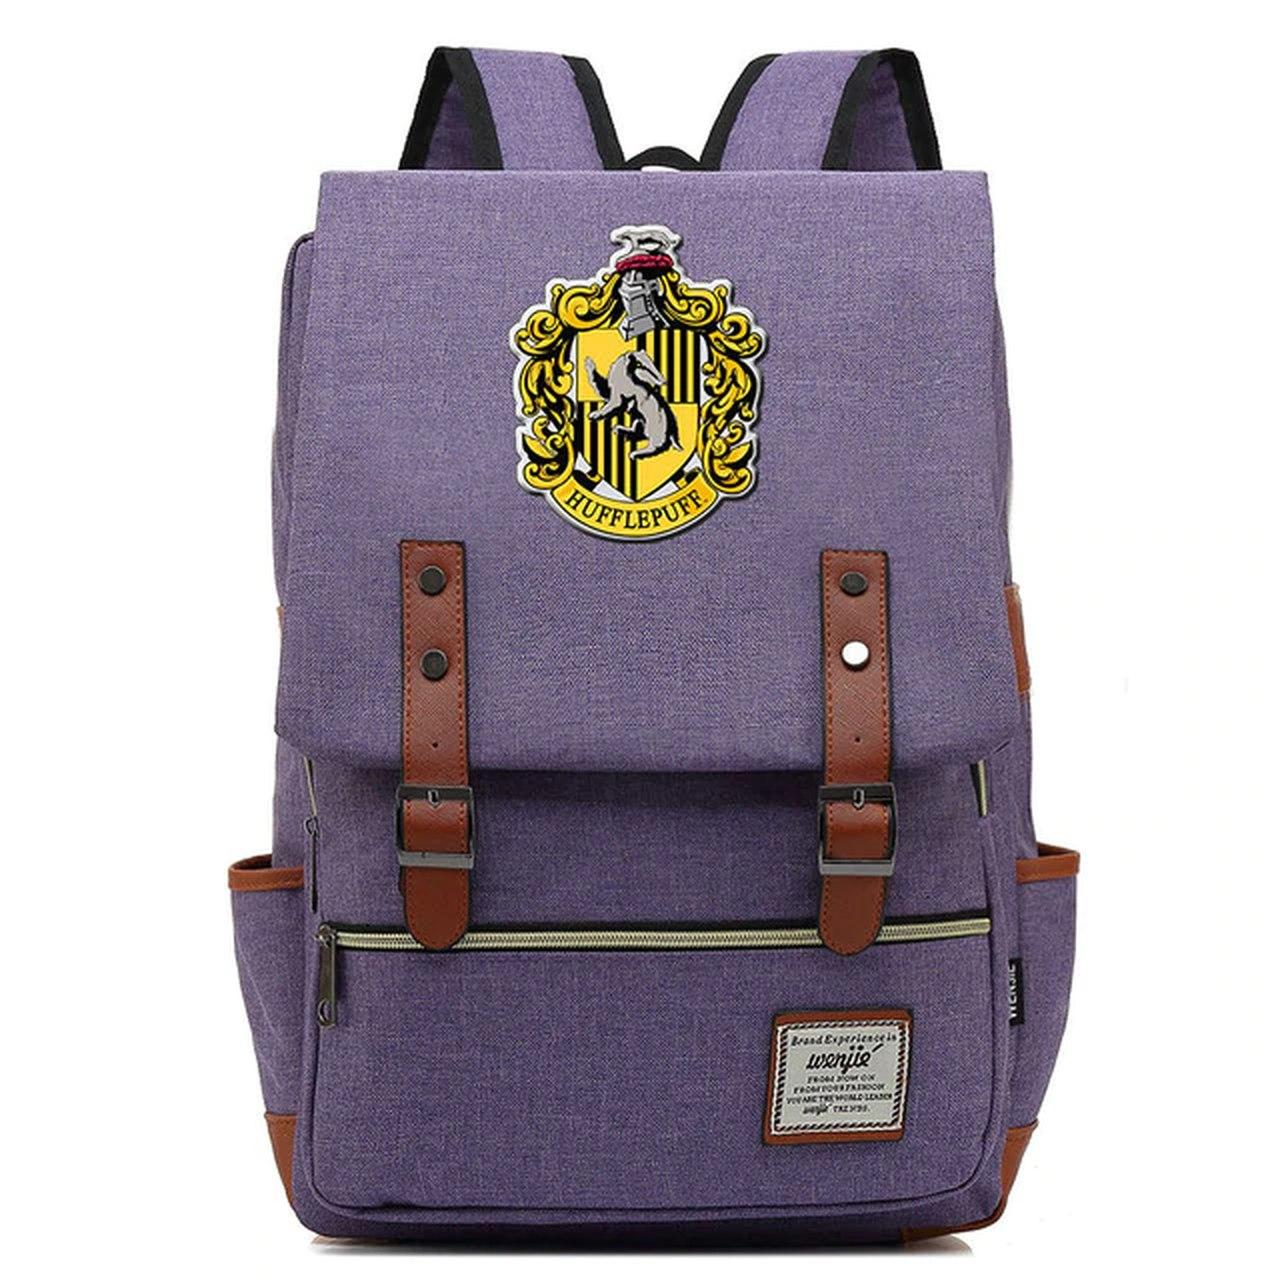 Mochila Hogwarts Casa  Lufa-Lufa: Harry Potter (Roxo)